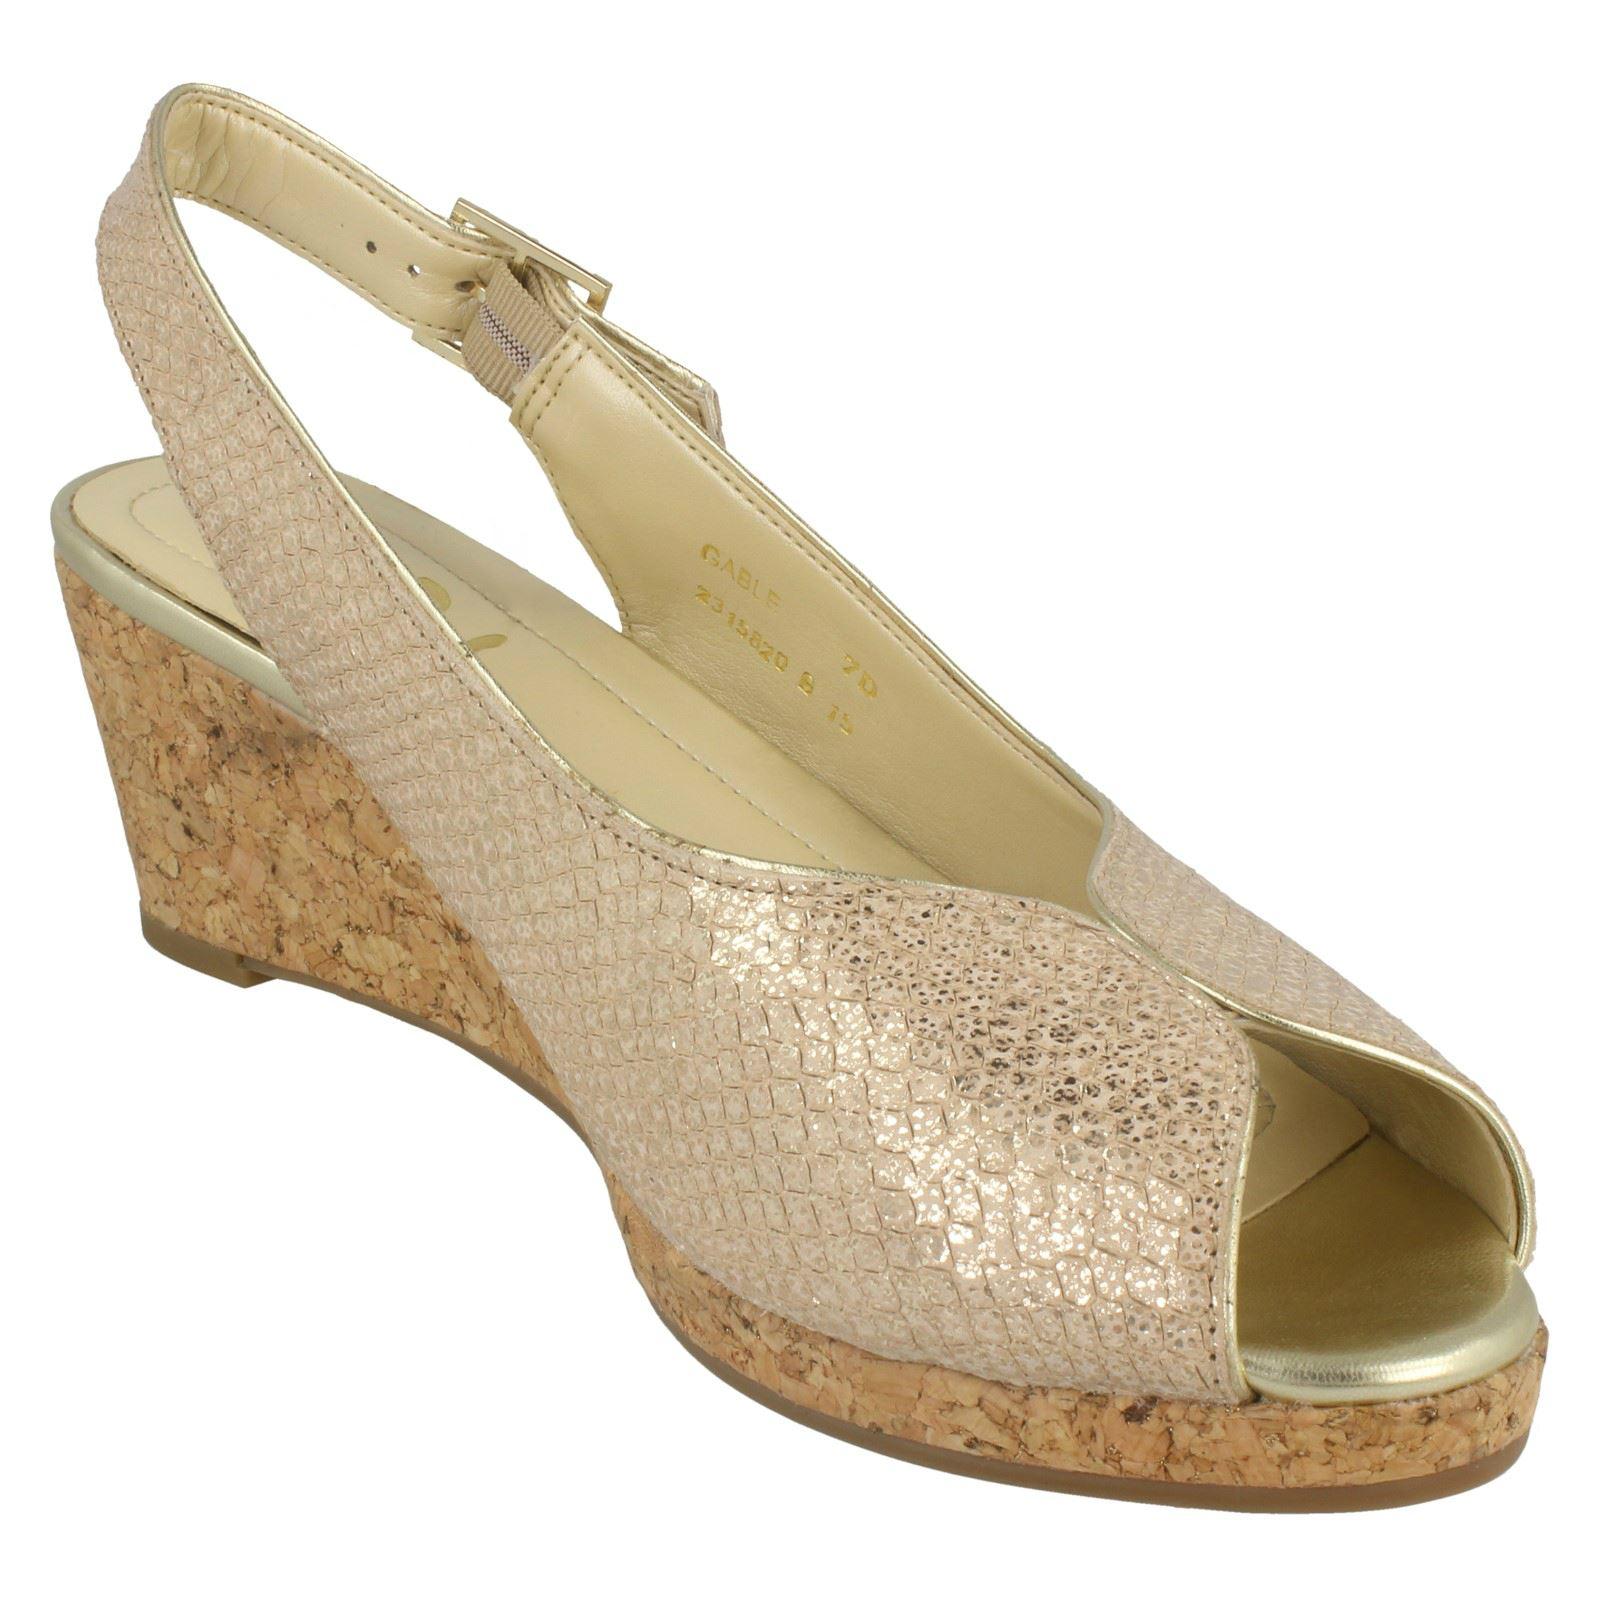 Ladies-Van-Dal-Cork-Wedge-Sandals-Gable thumbnail 7